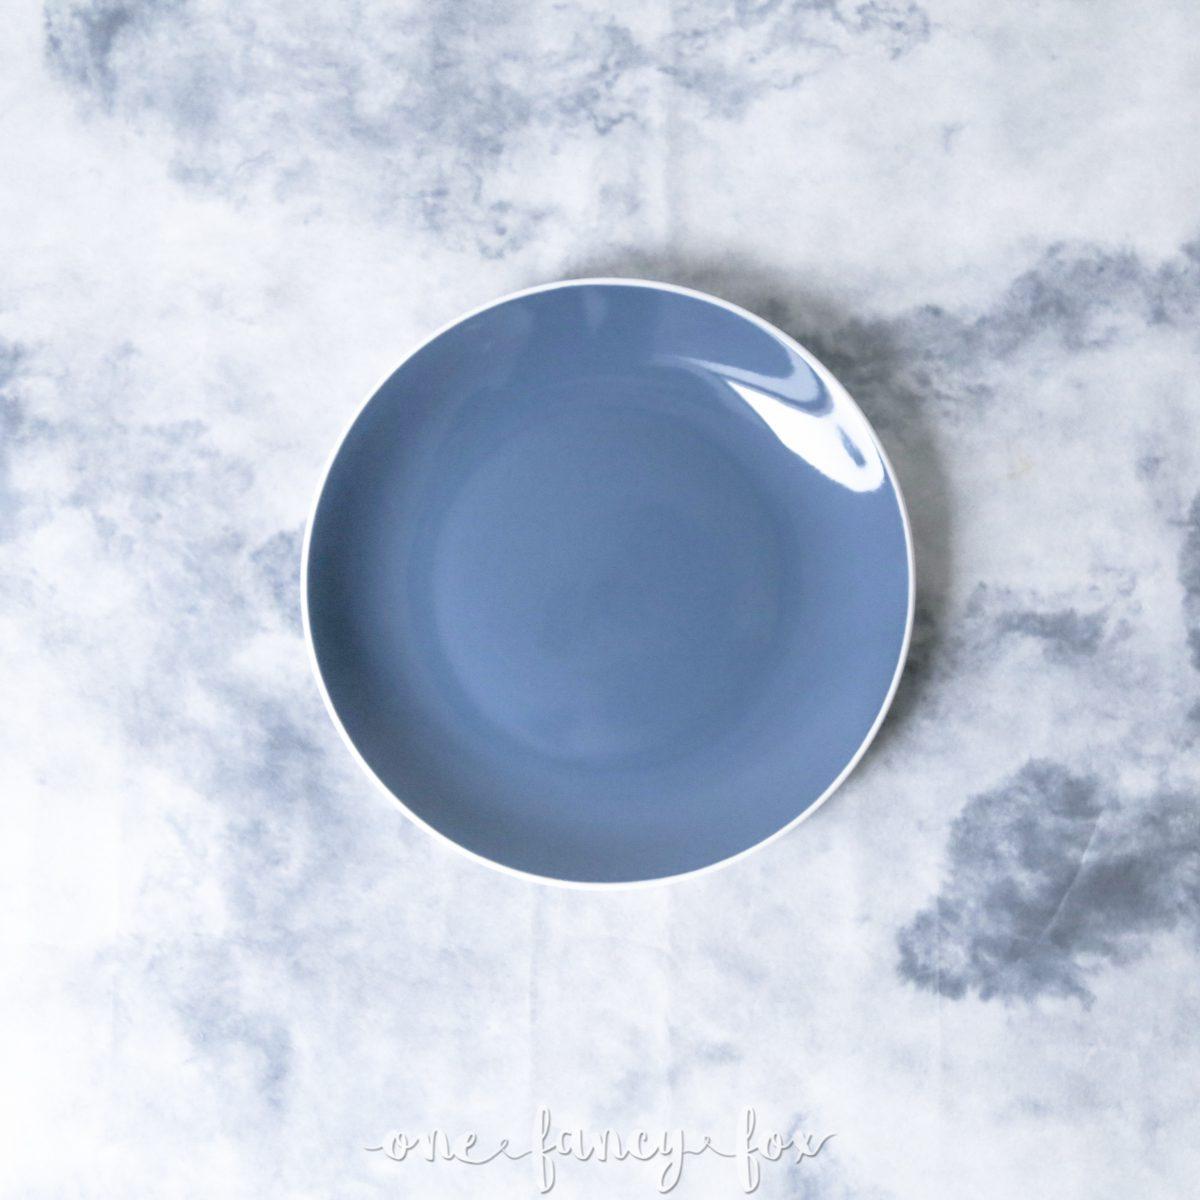 Teller Blau mieten